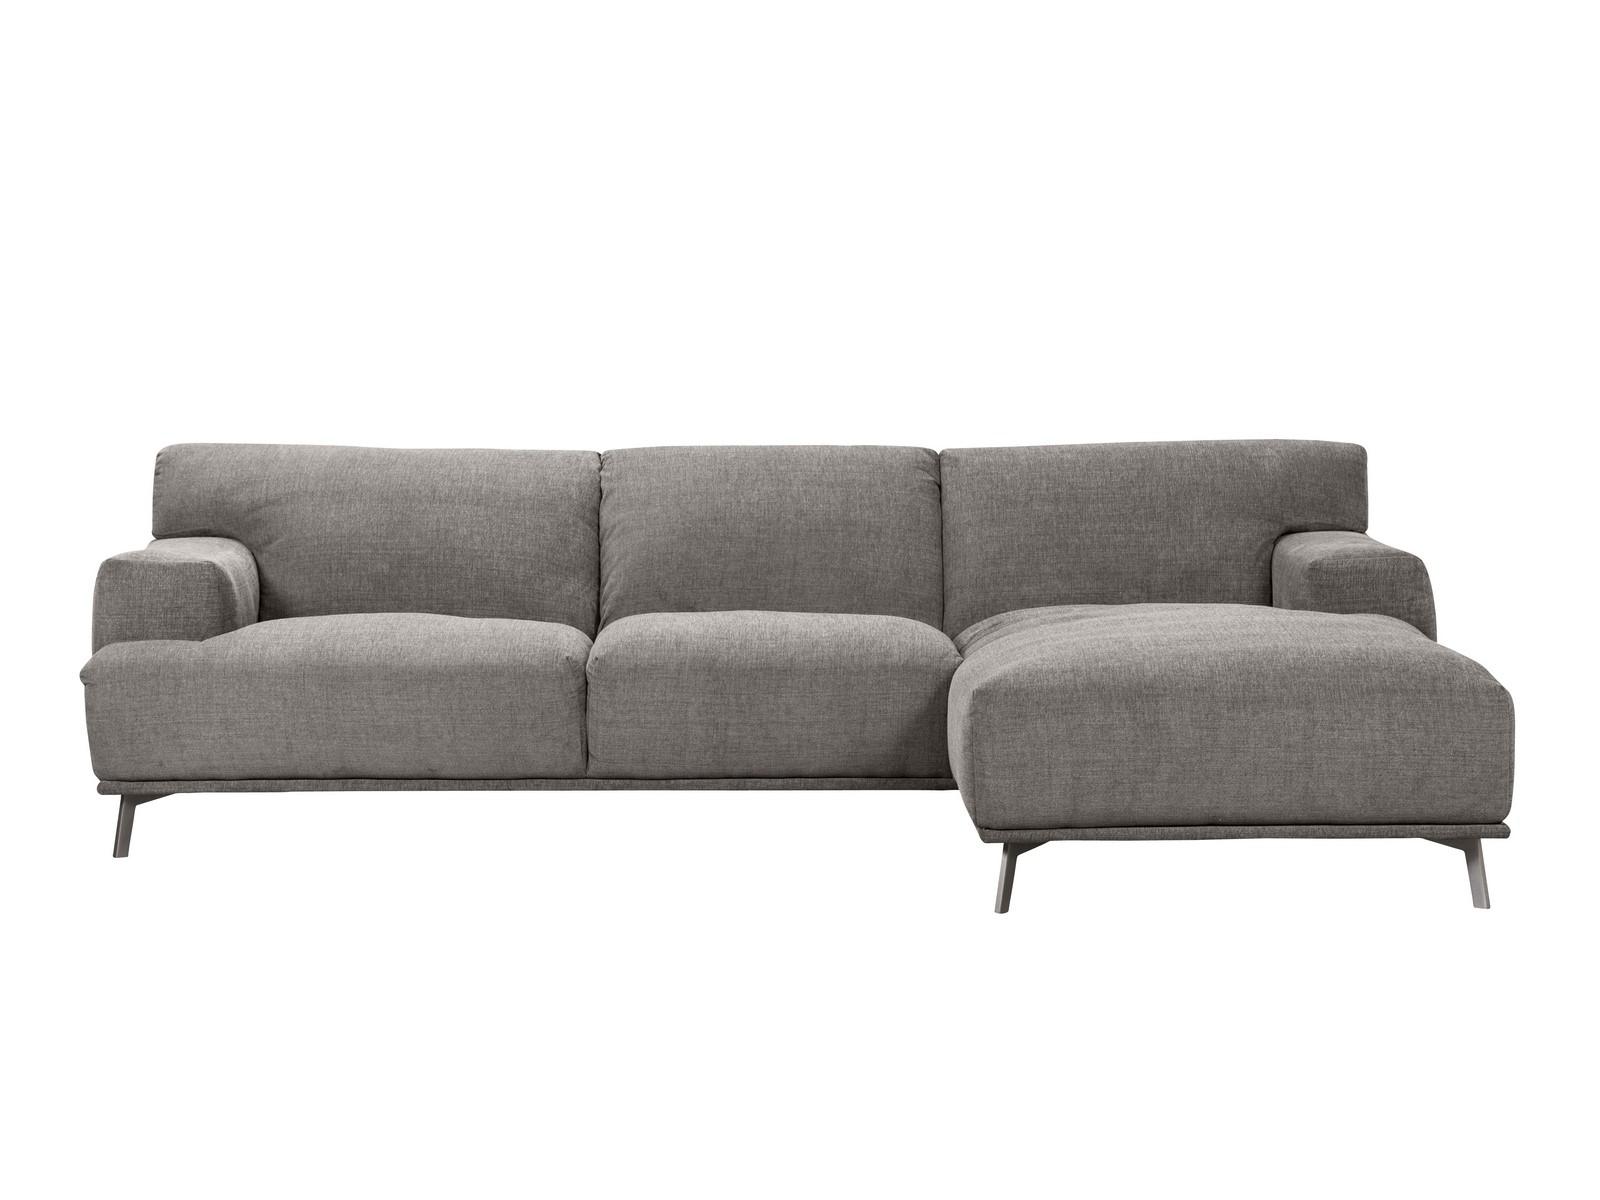 furninova rocco module sofa system innoshop. Black Bedroom Furniture Sets. Home Design Ideas